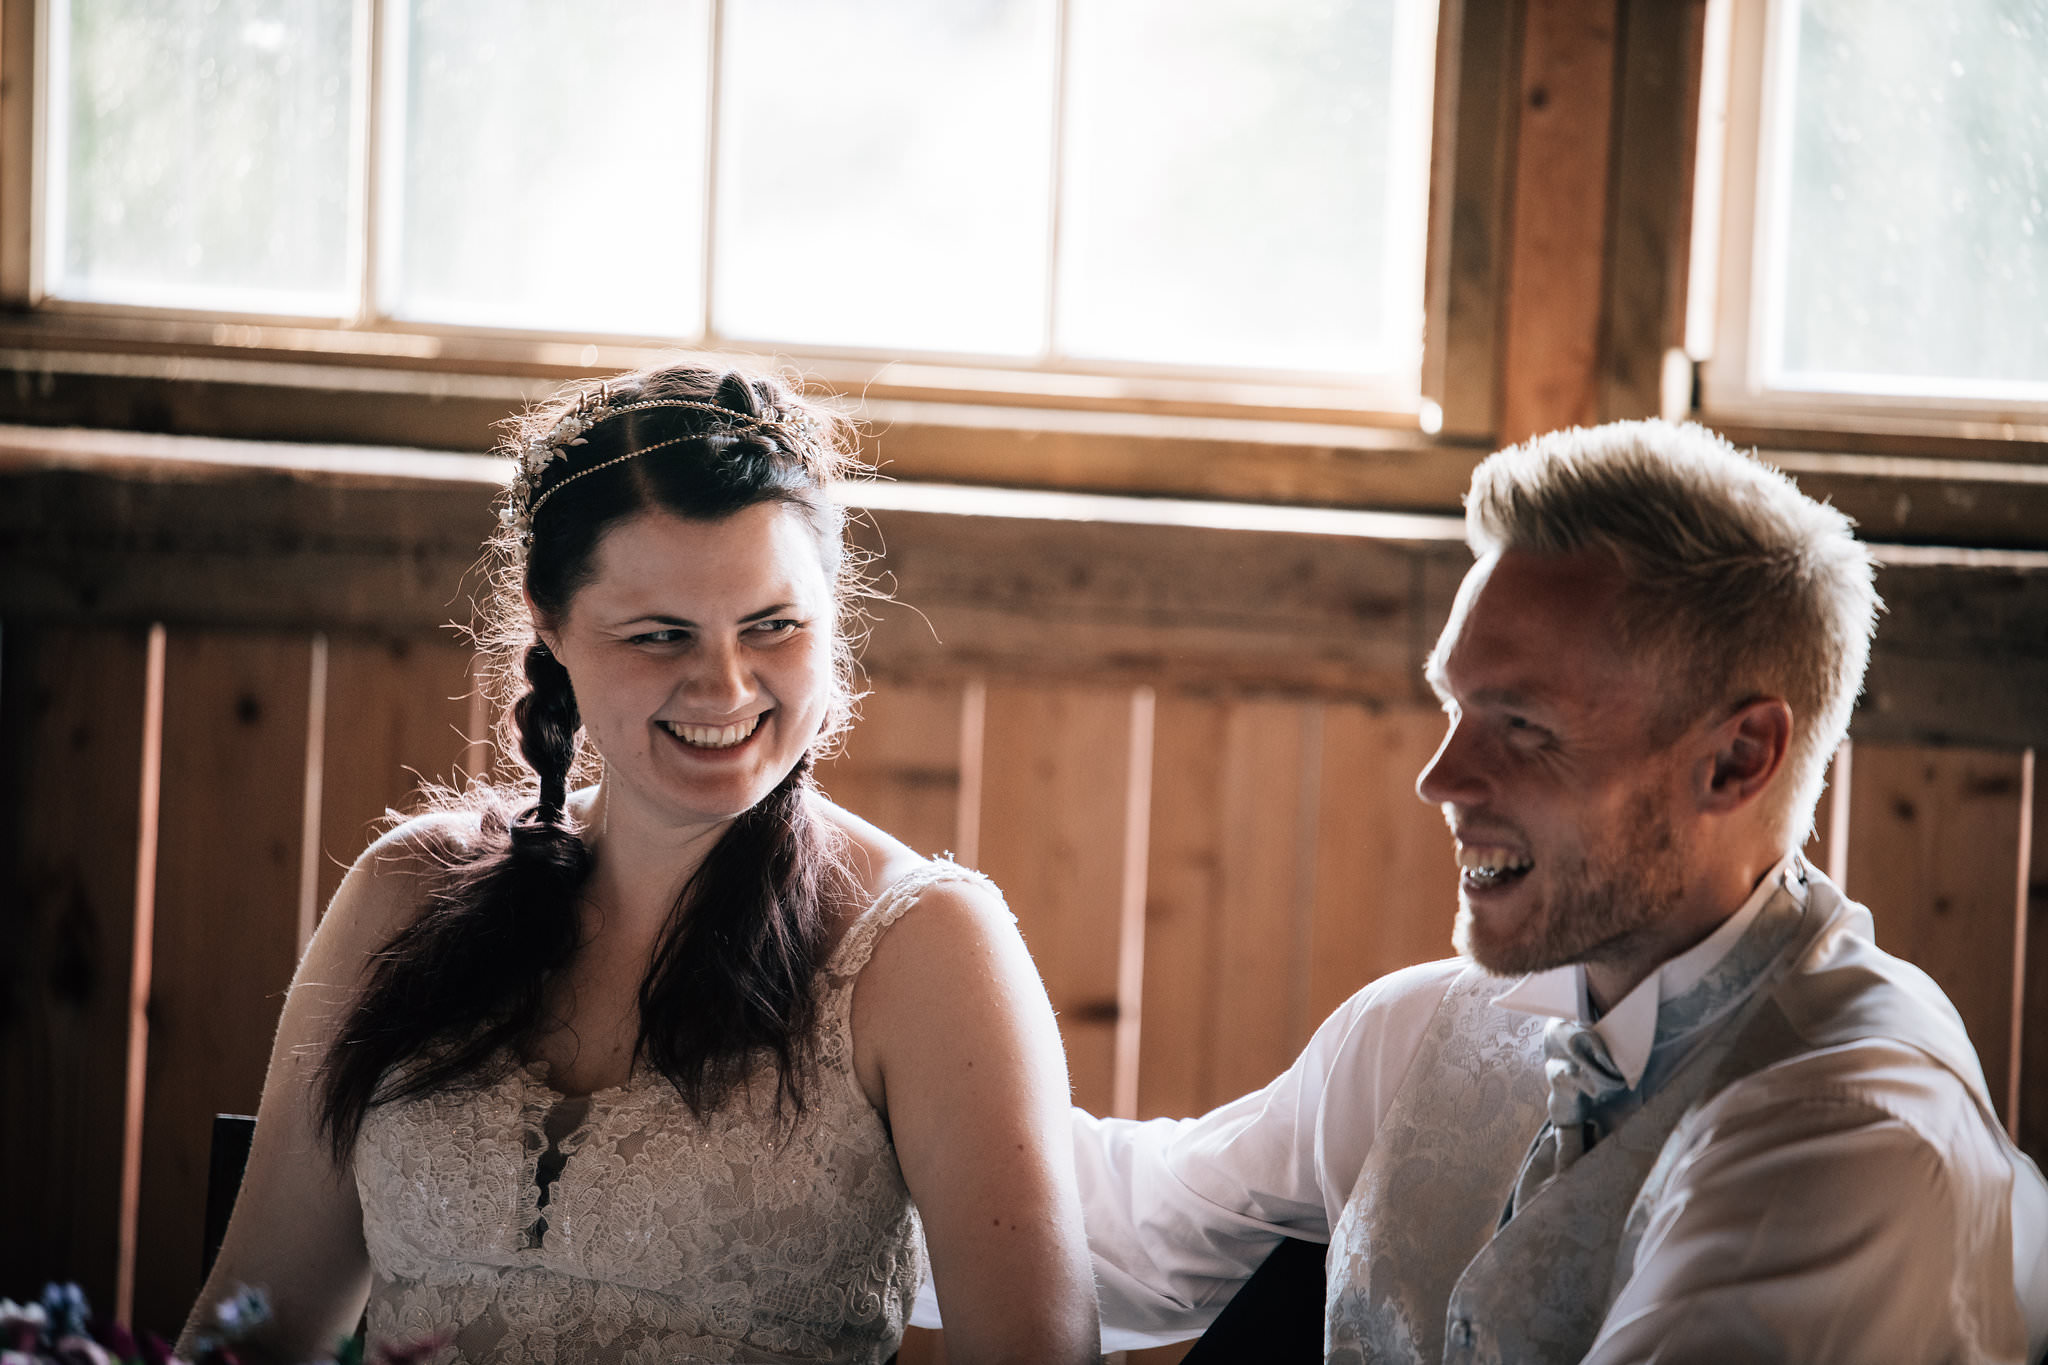 _N850500-fotograf-vestfold-bryllupsfotograf-.jpg